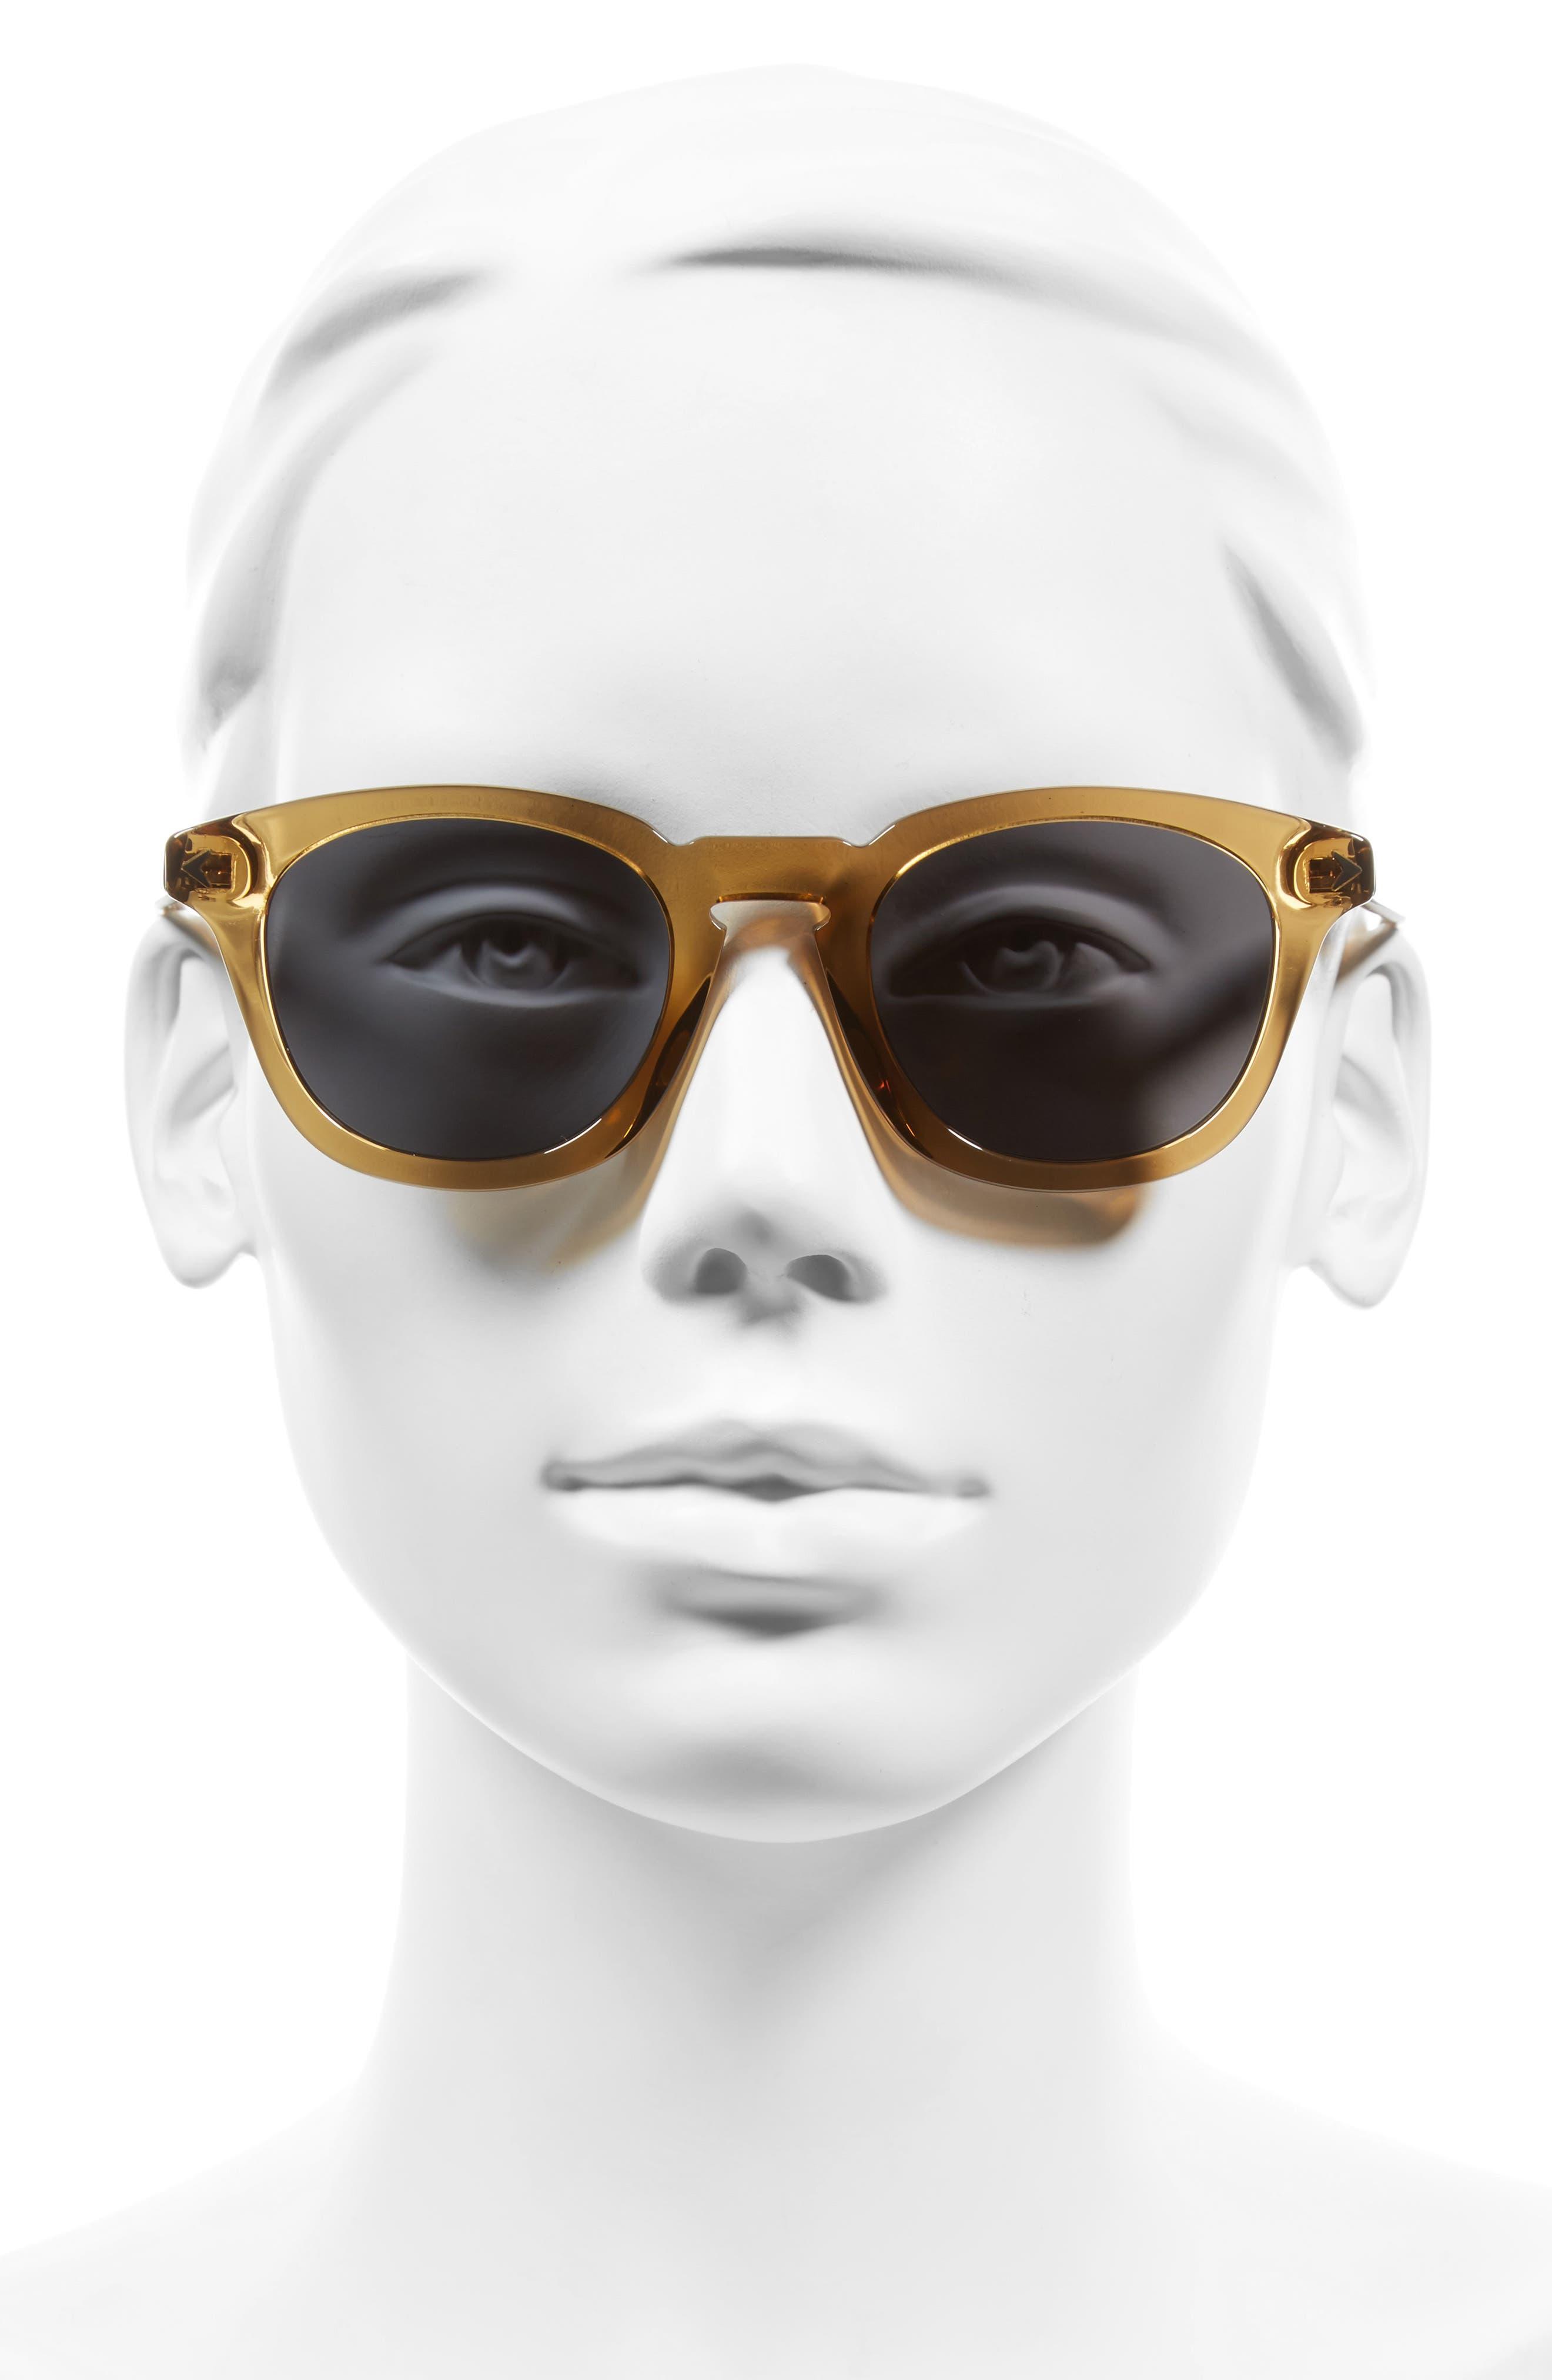 48mm Polarized Sunglasses,                             Alternate thumbnail 2, color,                             Beige